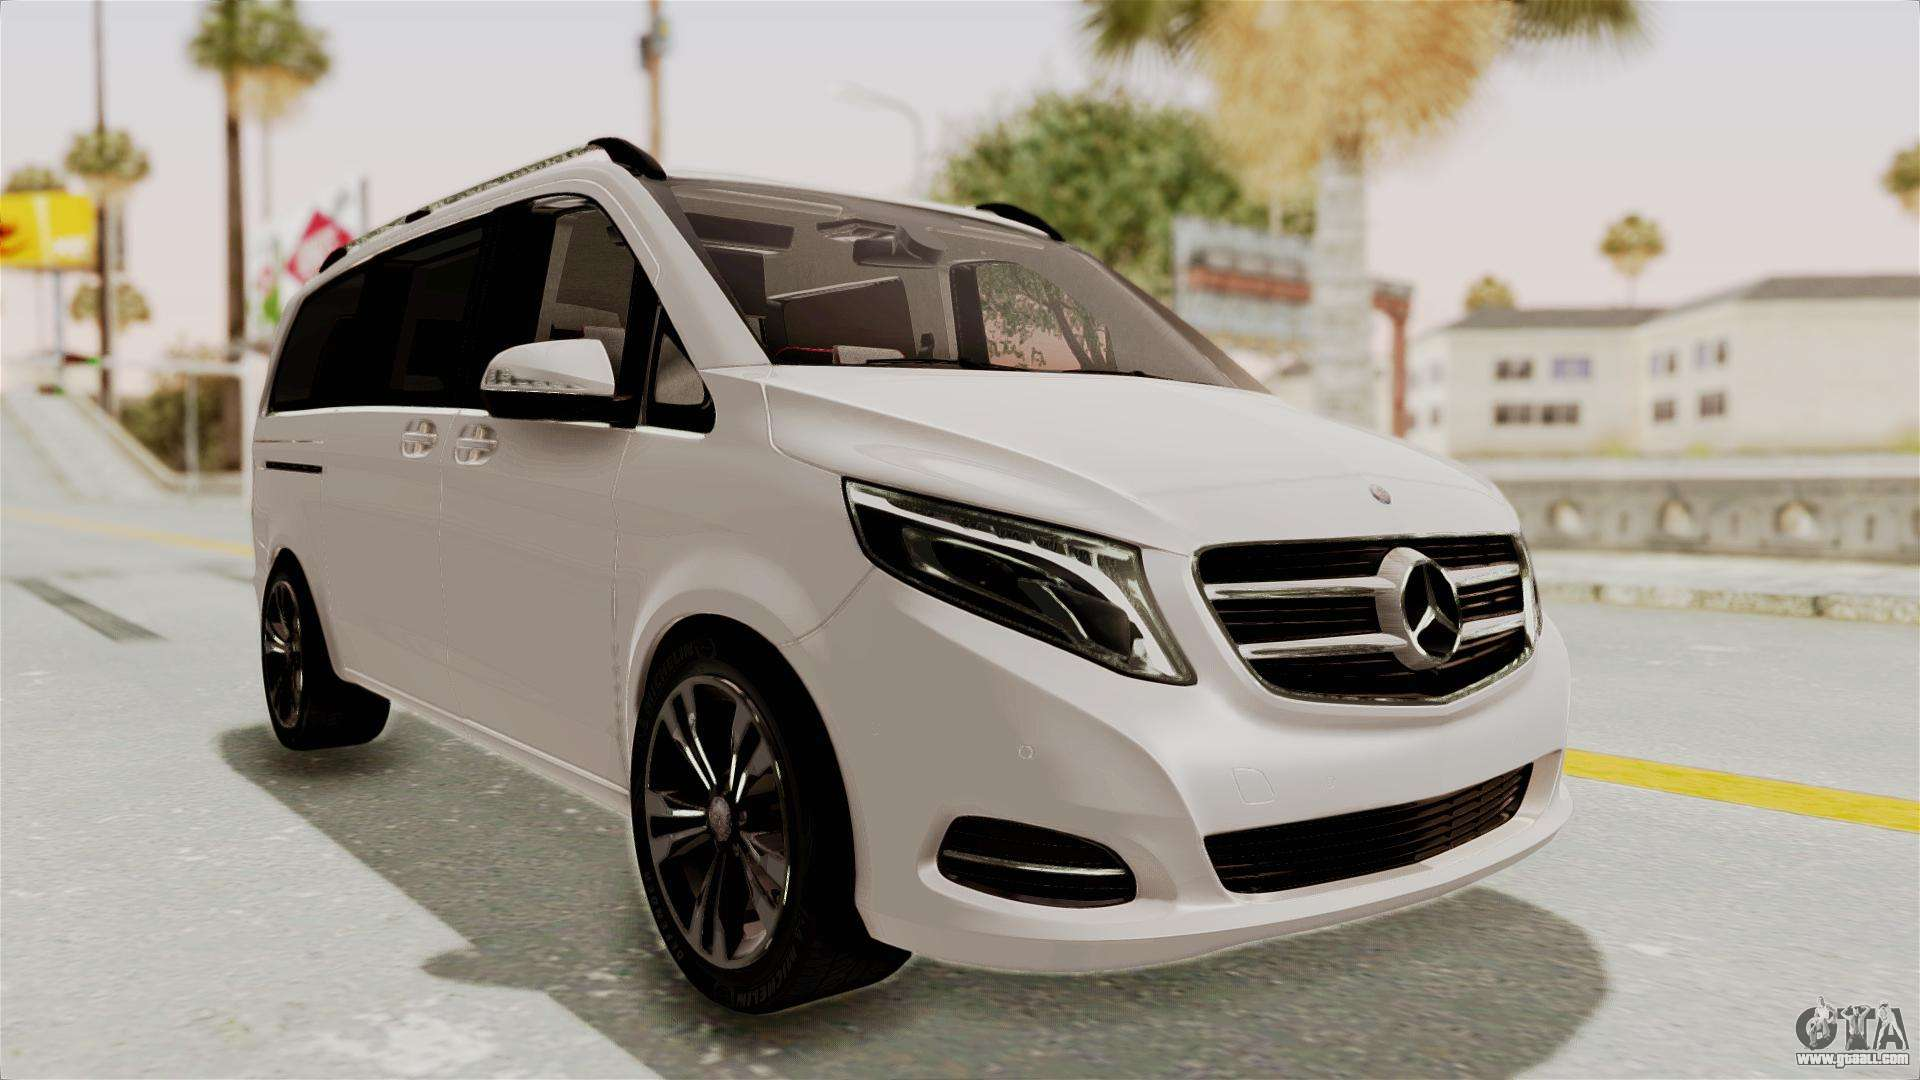 van wb normal price features roof in sprinter benz cargo reviews mercedesbenz photo photos minivan mercedes